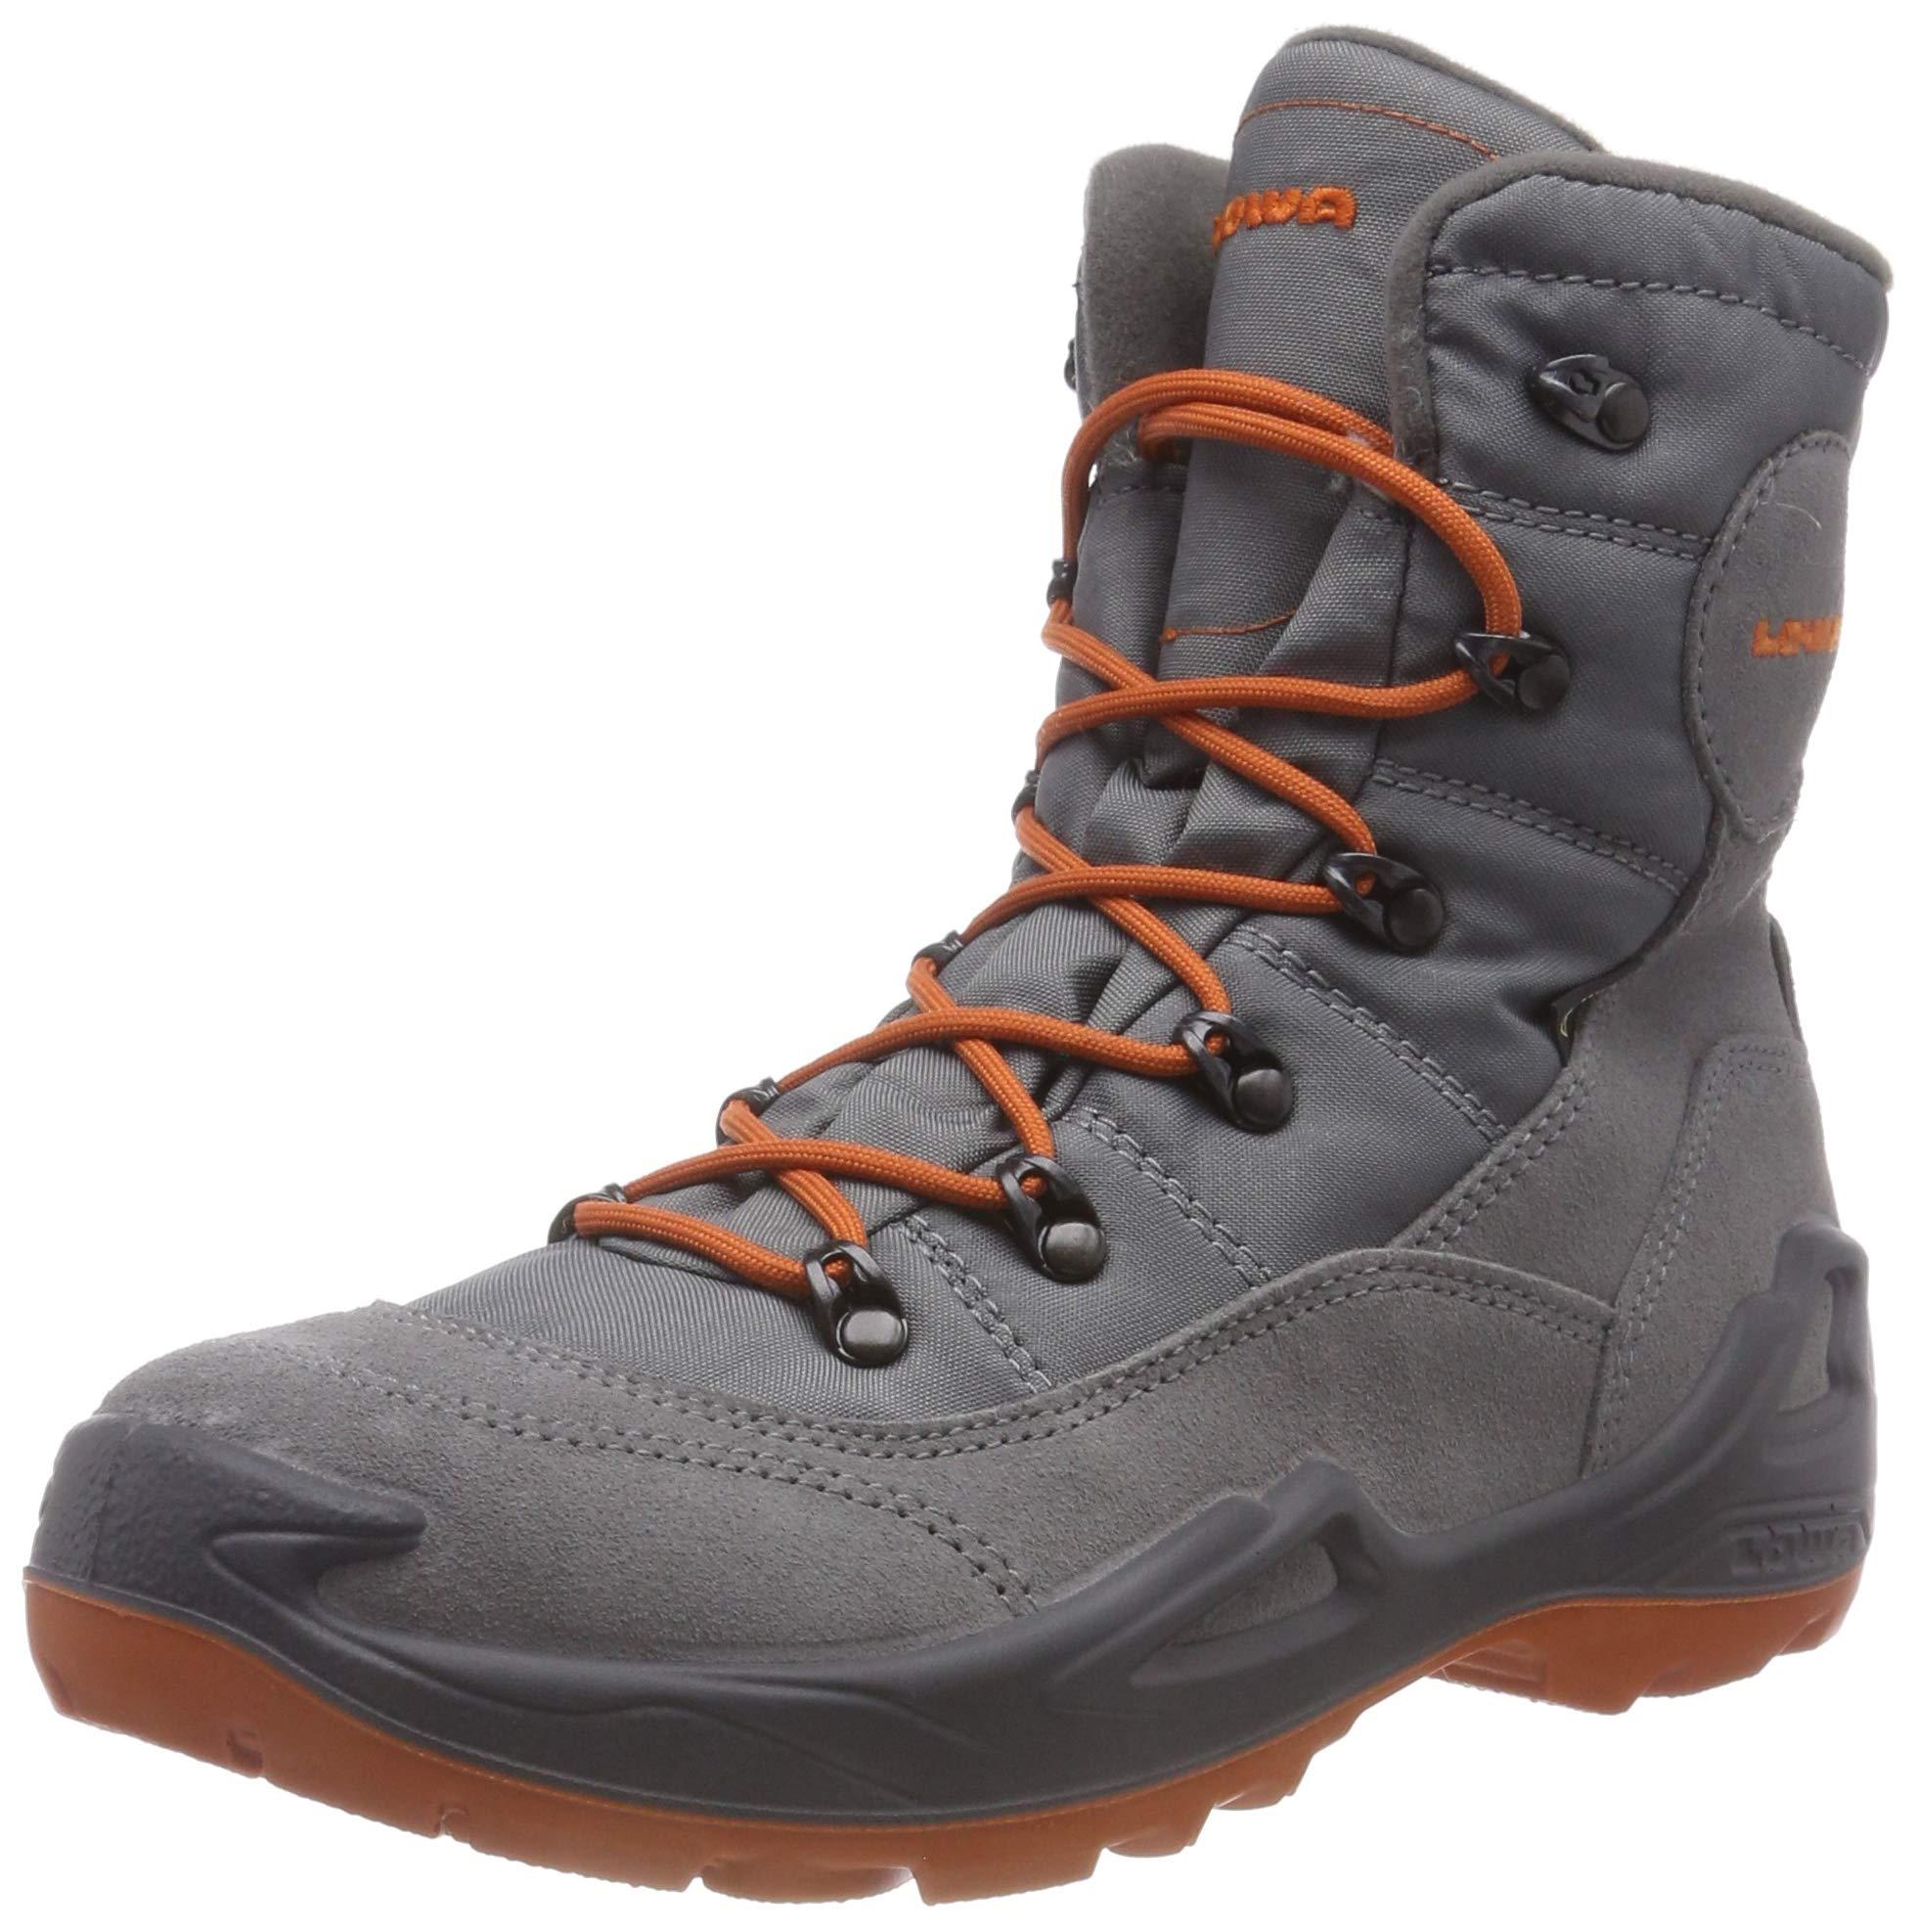 Lowa Unisex Kids Rufus Iii GTX Hi High Rise Hiking Boots 1